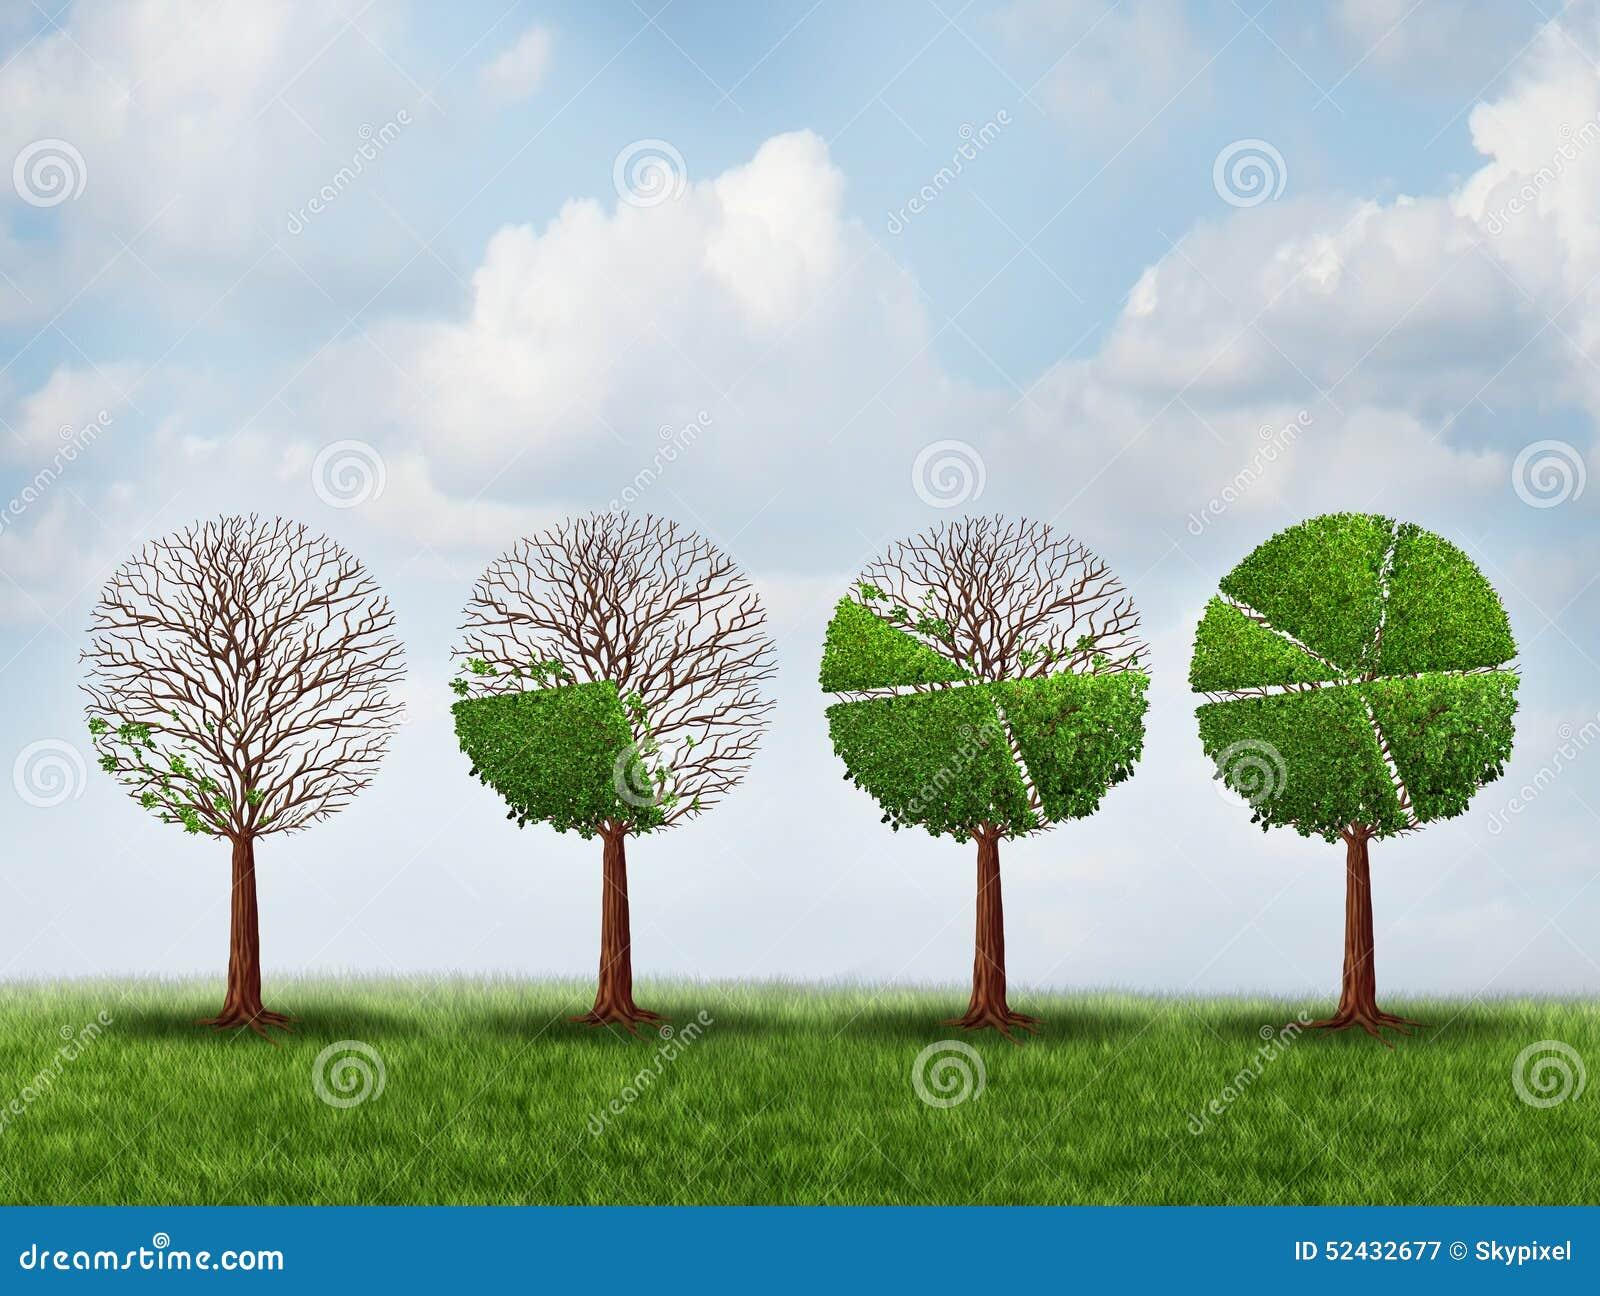 Economic prosperity stock illustration image 52432677 - Gardening in prisons plants and social rehabilitation ...